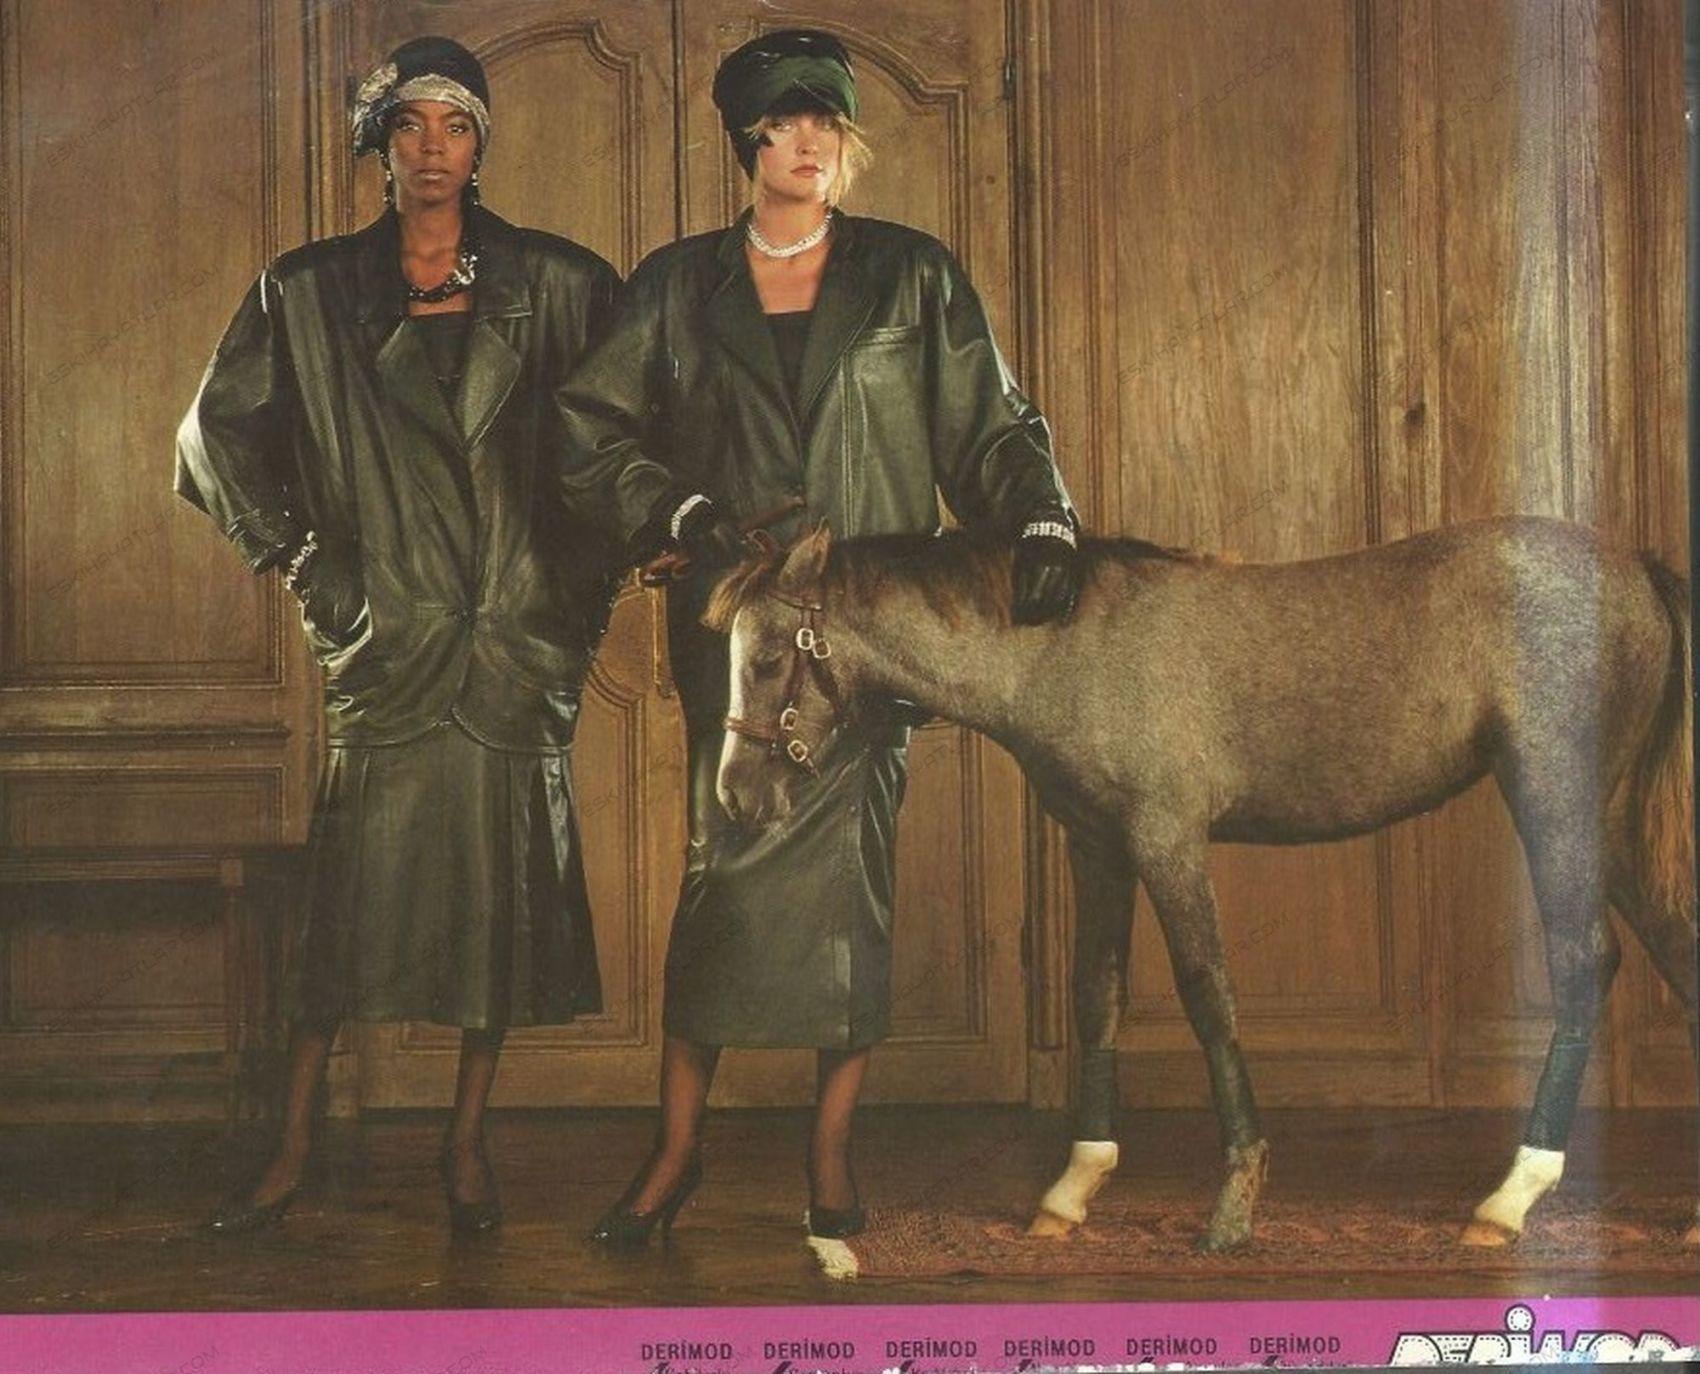 0342-derimod-at-ve-iki-kadin-reklam-1985-umit-zaim